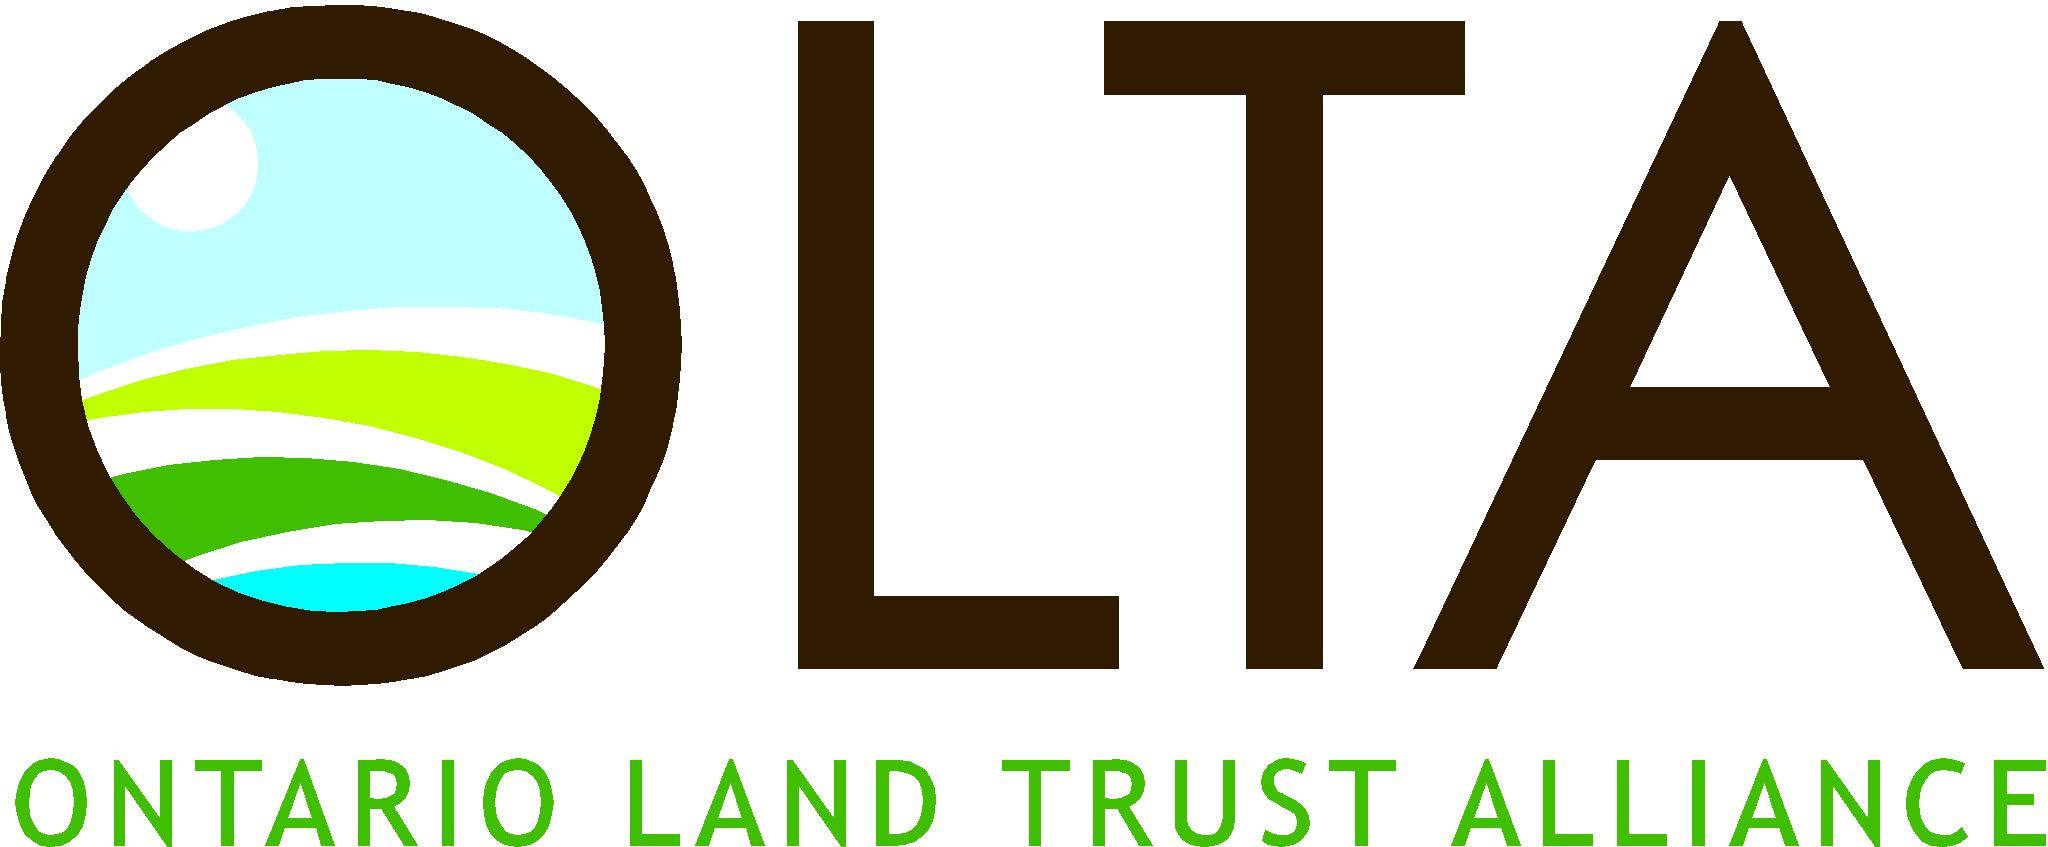 OLTA_logo_-_Copy.jpg